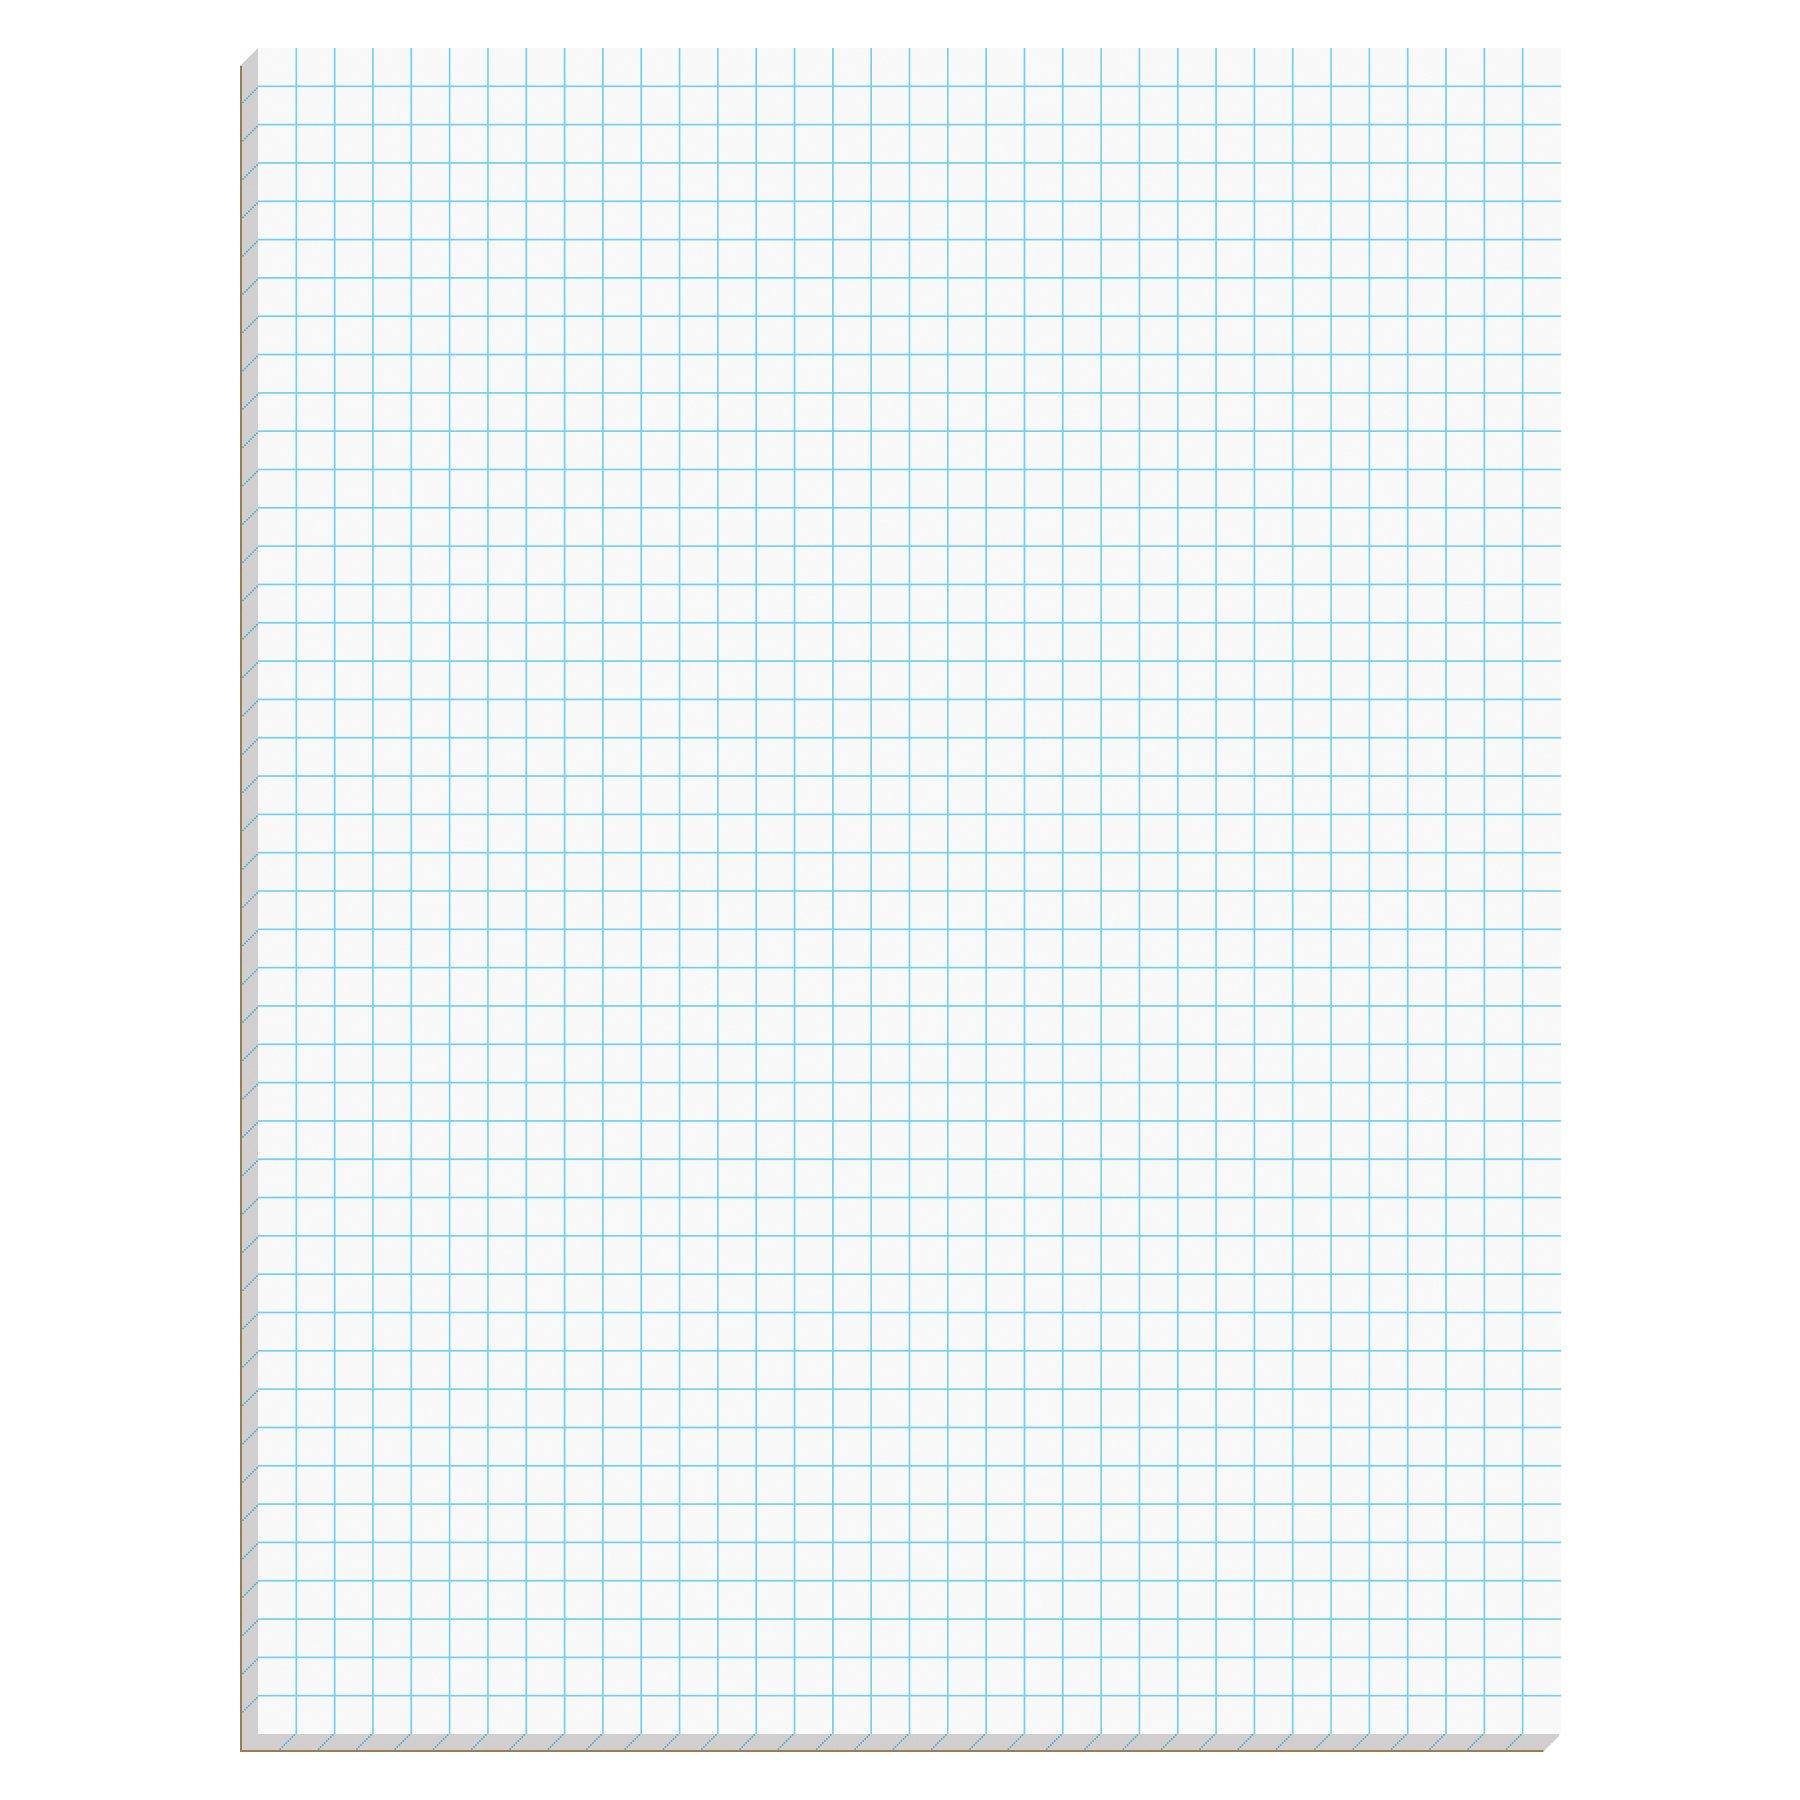 TOPS Quadrille Pad, Gum-Top, 8-1/2 x 11 Inches, Quad Rule (4 x 4), White Paper, 50 Sheets per Pad (33140)